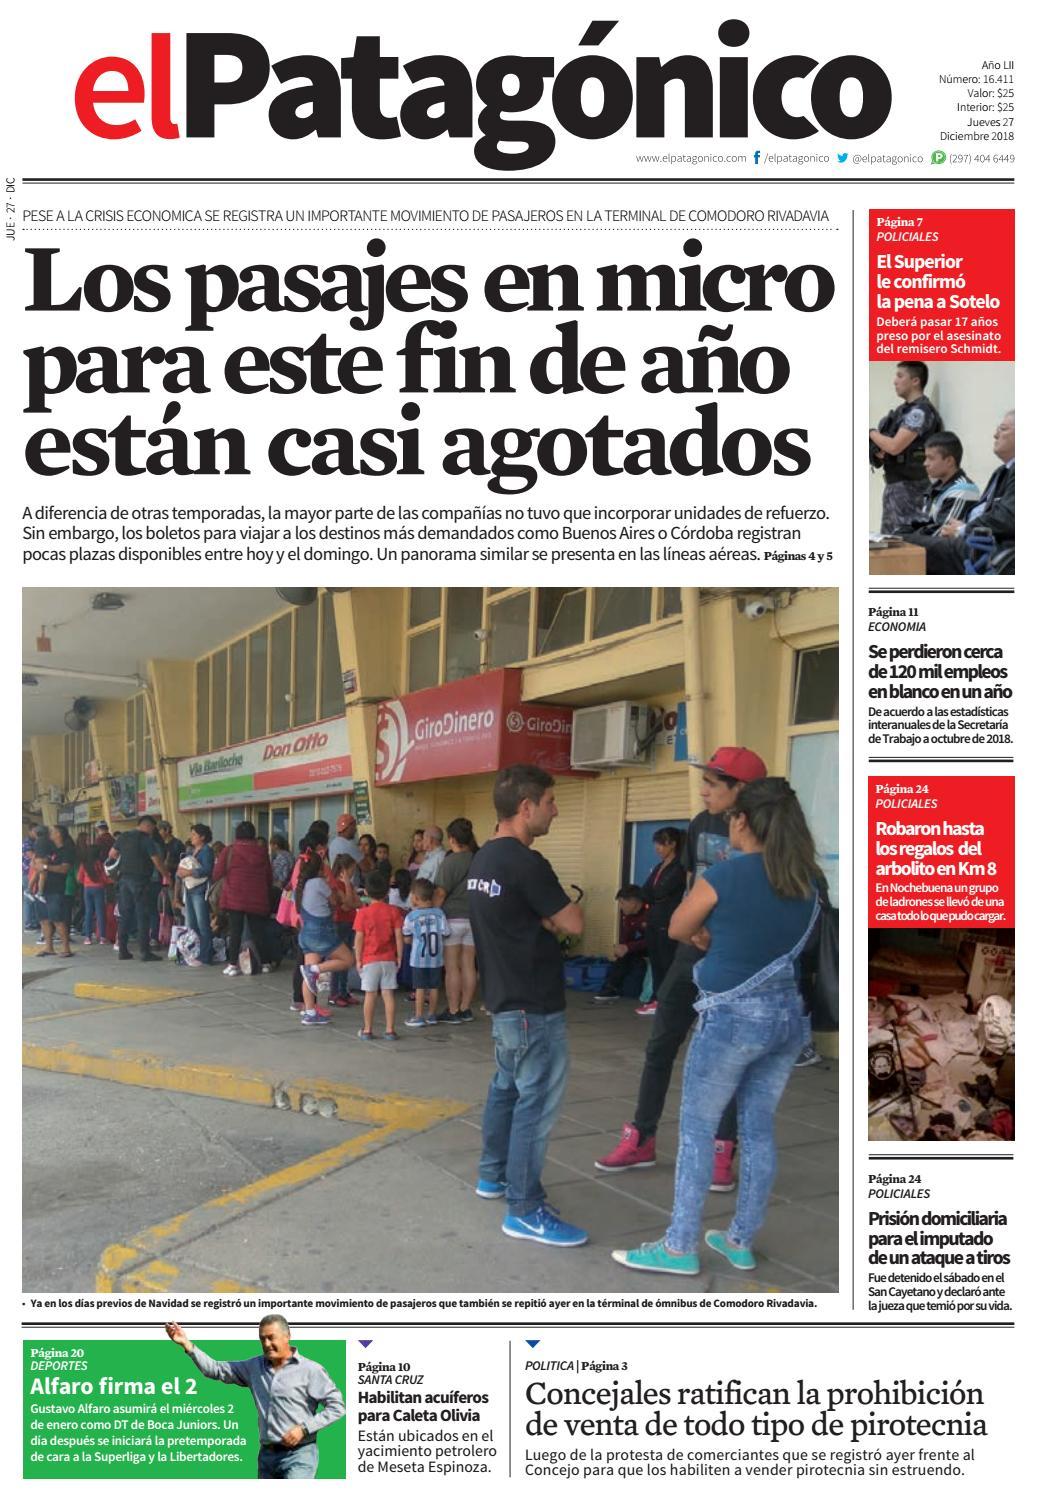 Retiros sin riesgo casino en Portugal afa seleccion argentina 178513